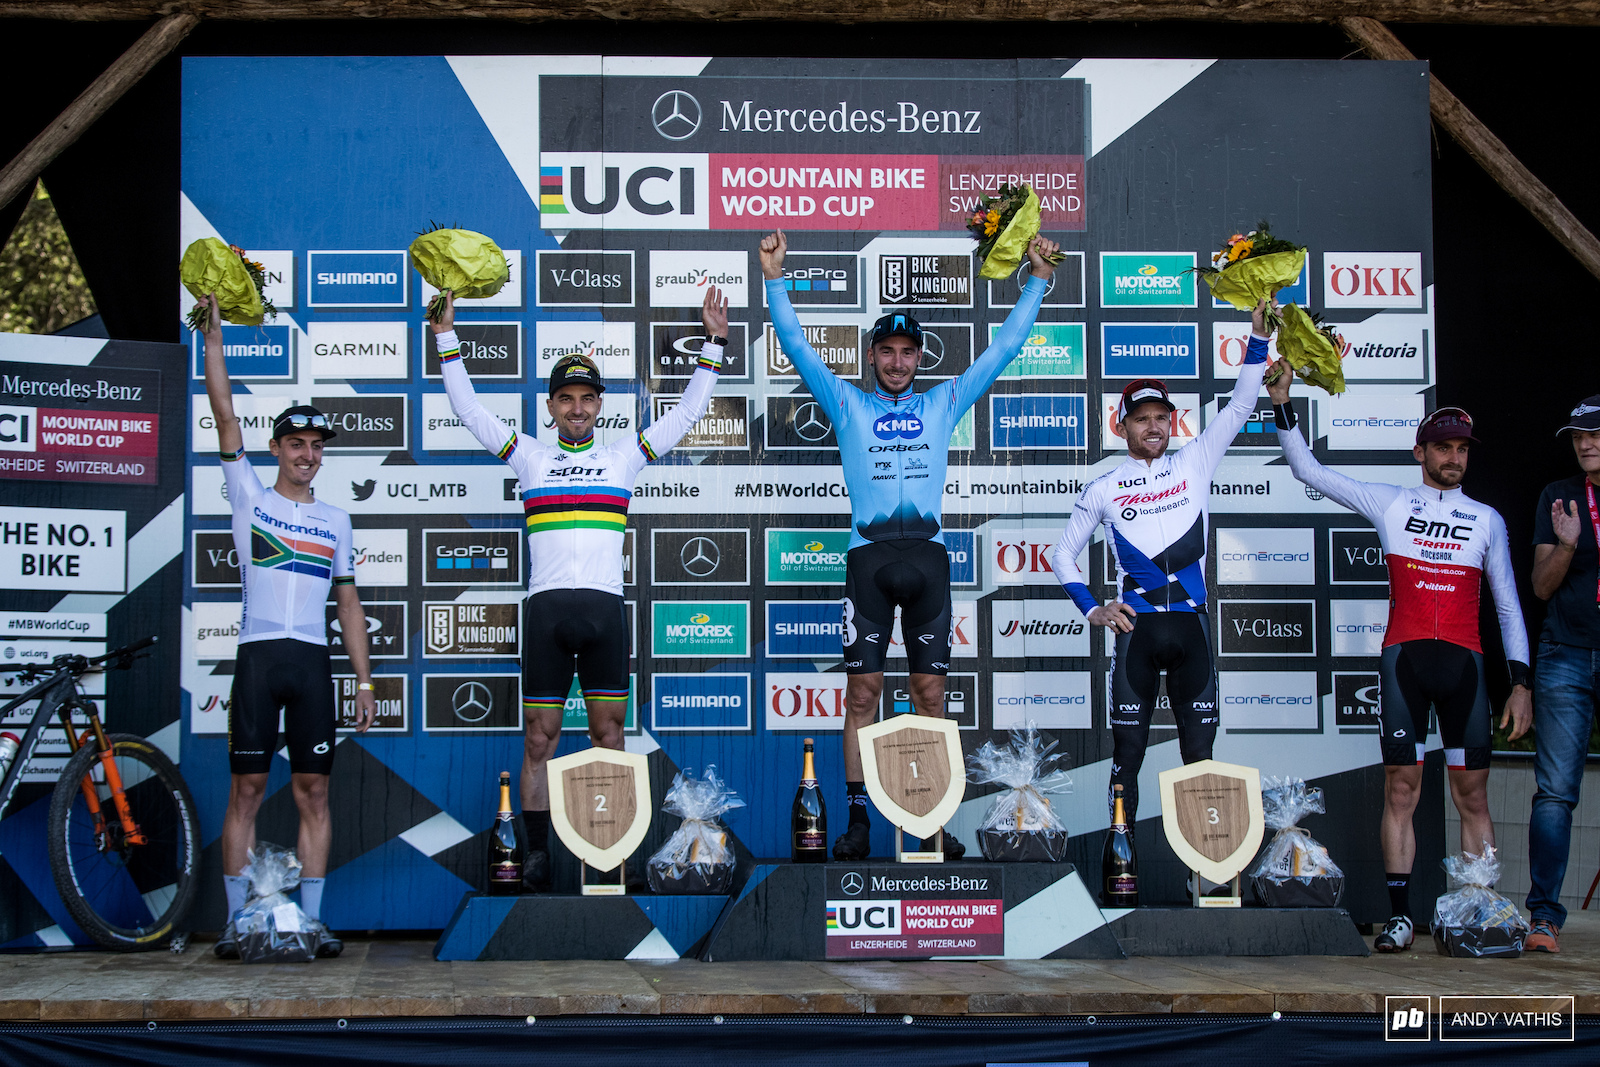 Your Elite Men s podium 1st Victor Koretzky 2nd Nino Schurter 3rd Mathias Flueckiger 4th Alan Hatherly and 5th Titouan Carod